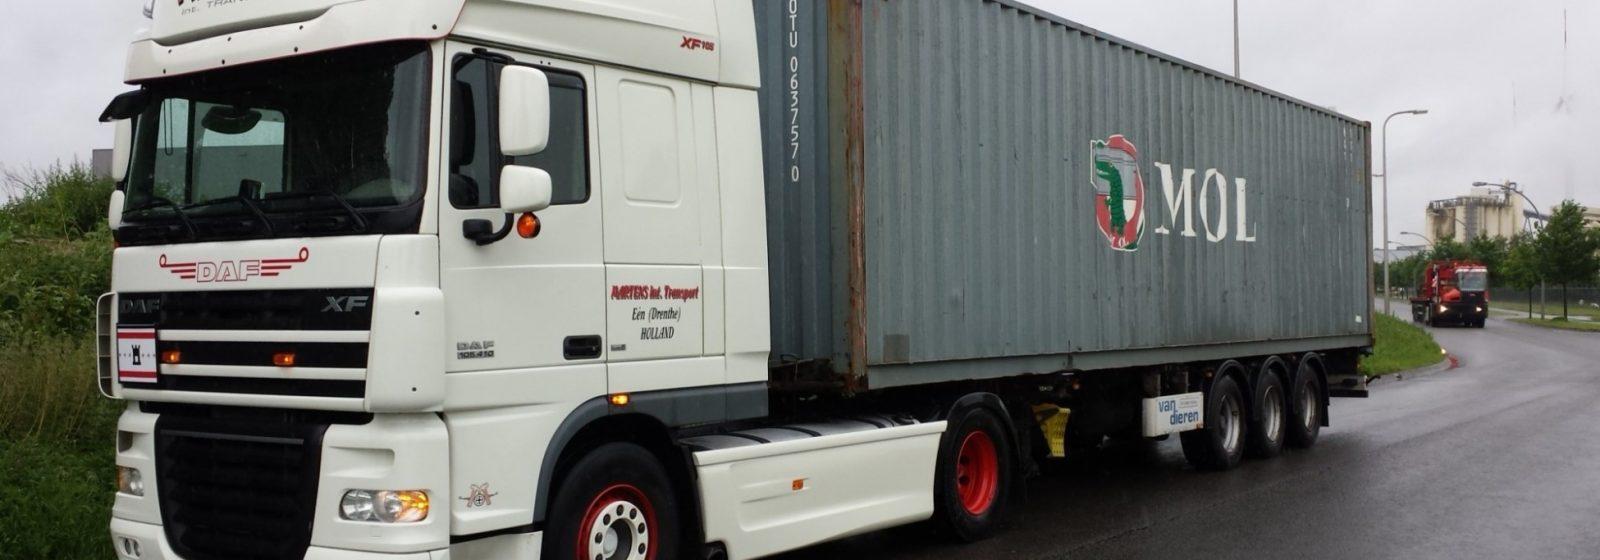 Martens int Transport